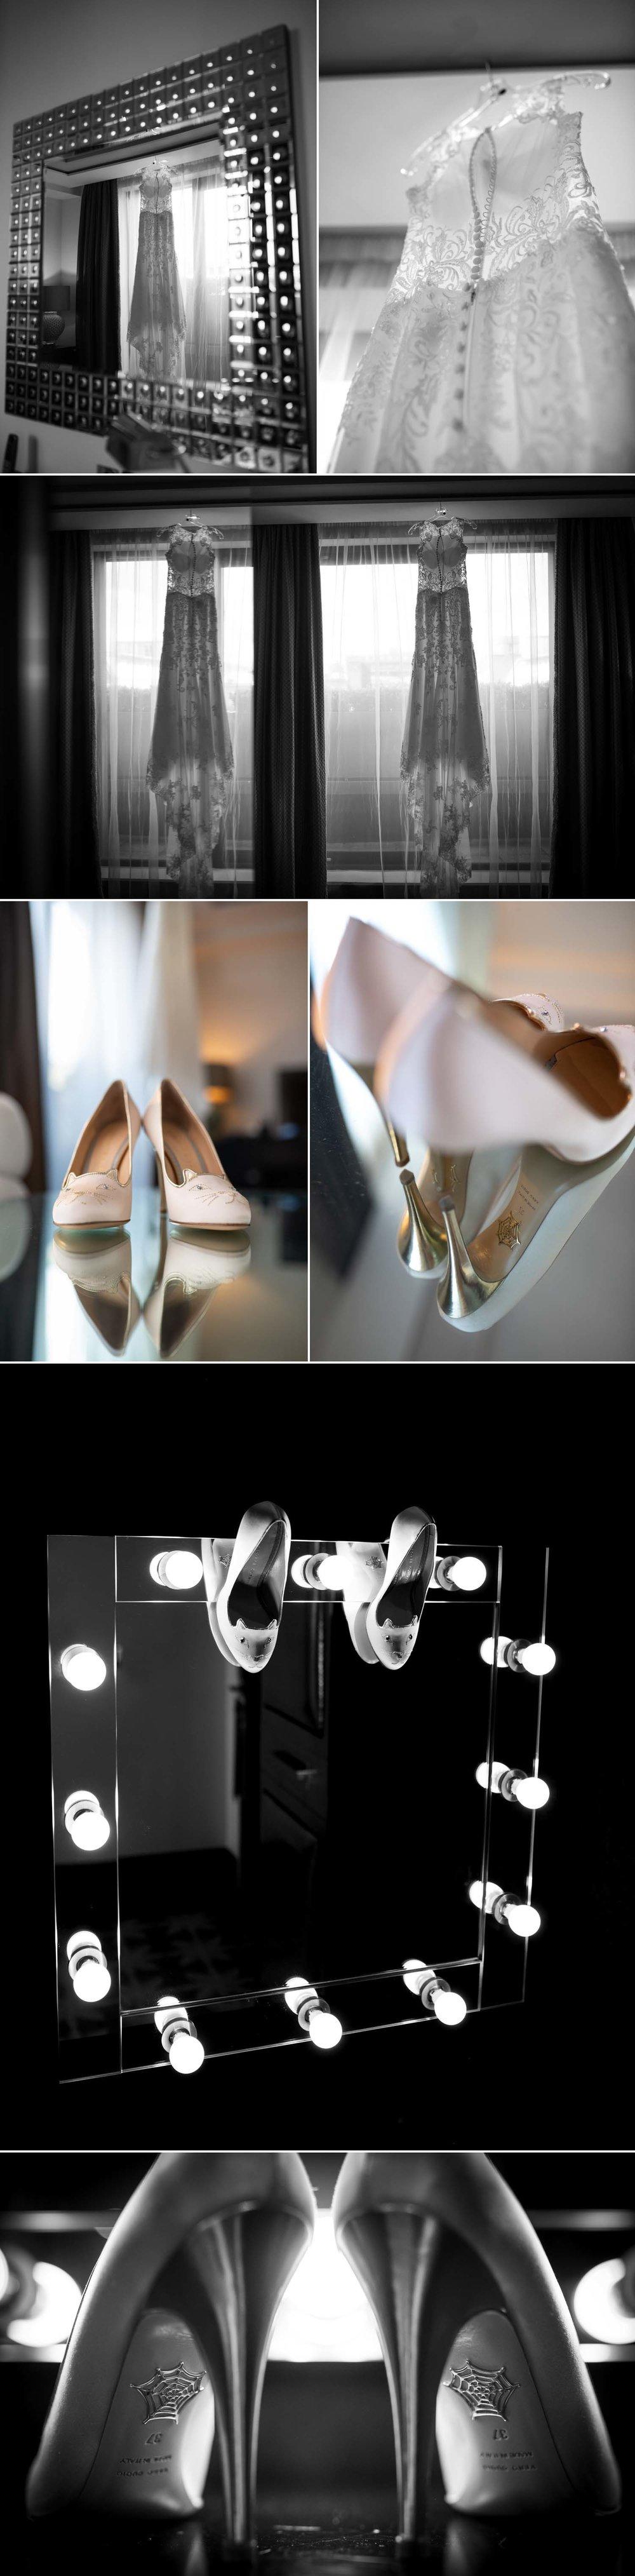 Merchant Hotel Belfast Wedding Photography James McGrillis 02.jpg